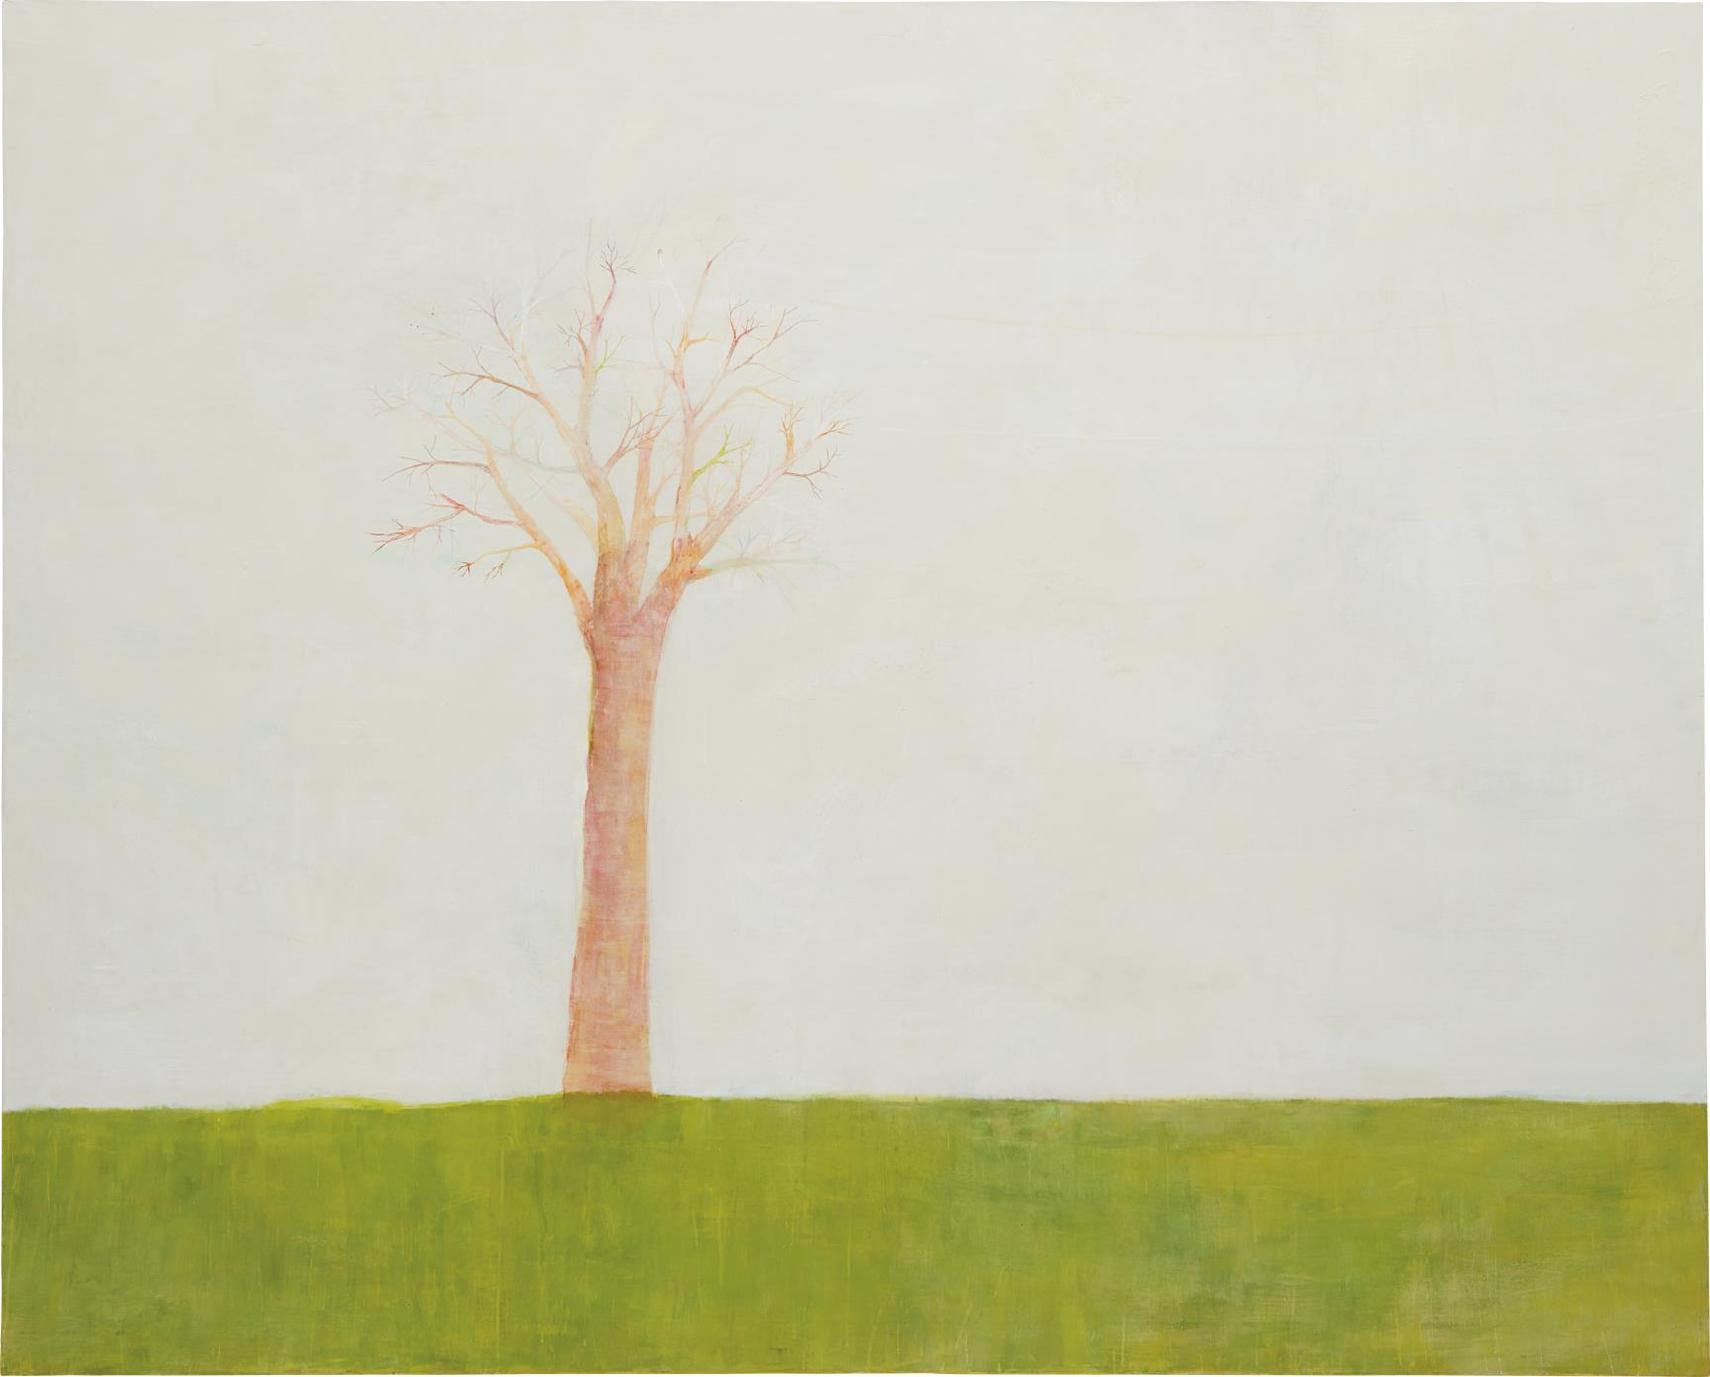 Hiroshi Sugito-The Big Tree-1998